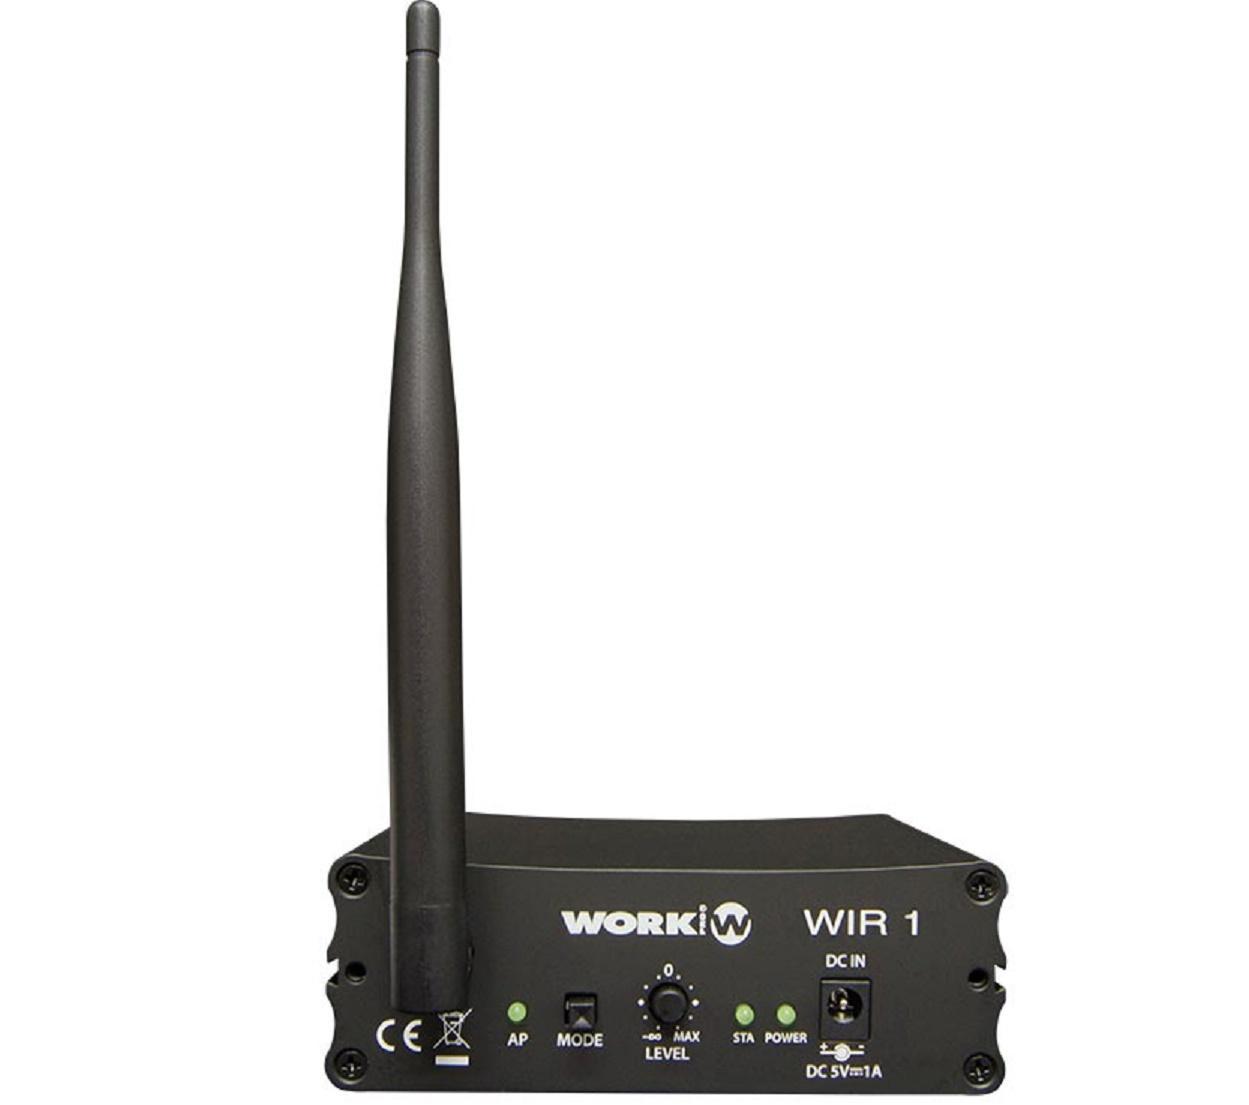 Work Wir 1 Receptor Audio WiFi